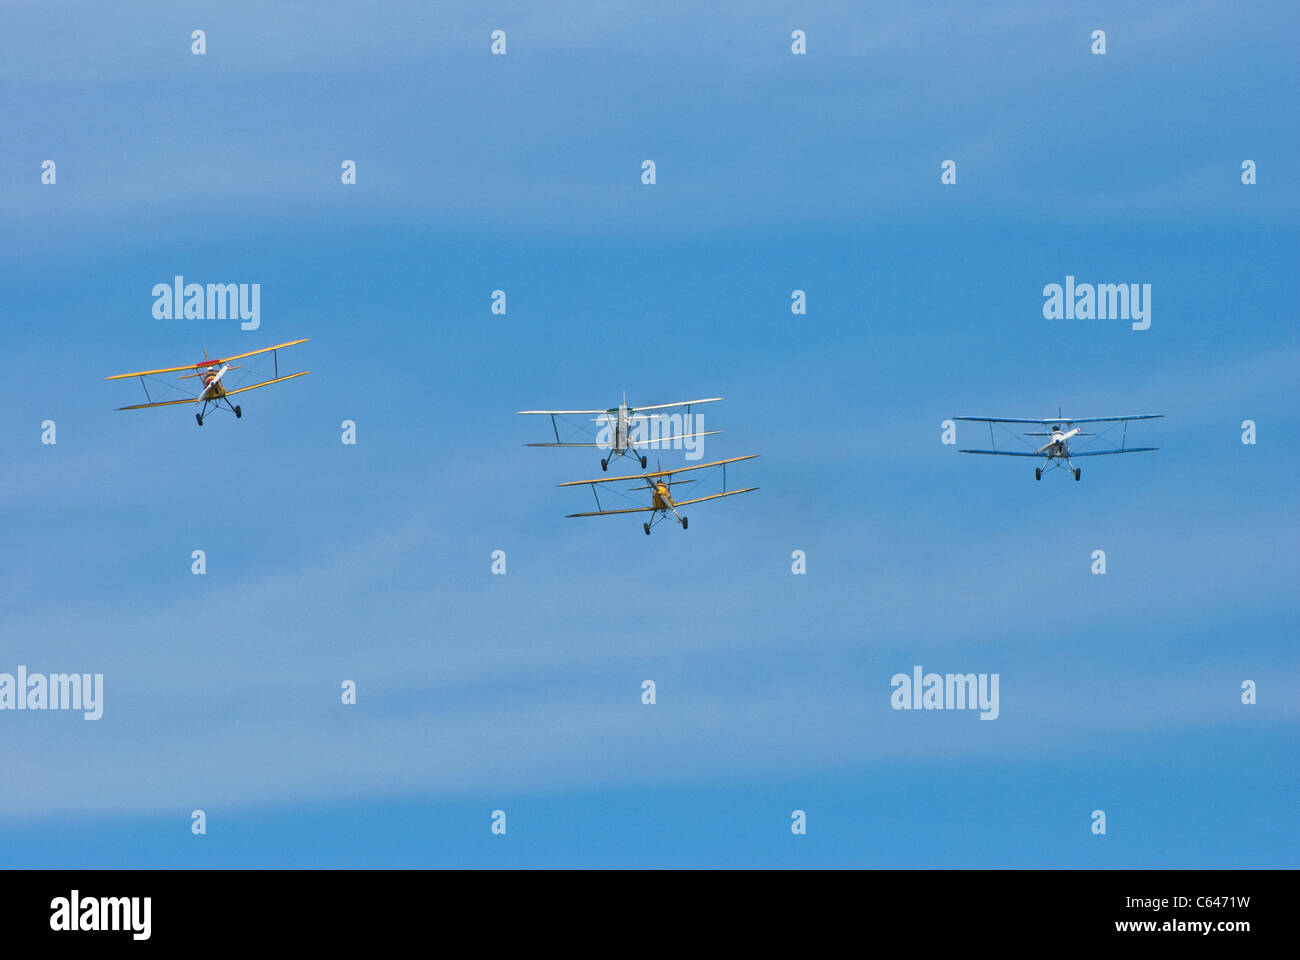 Four Stampe bi-planes - Stock Image